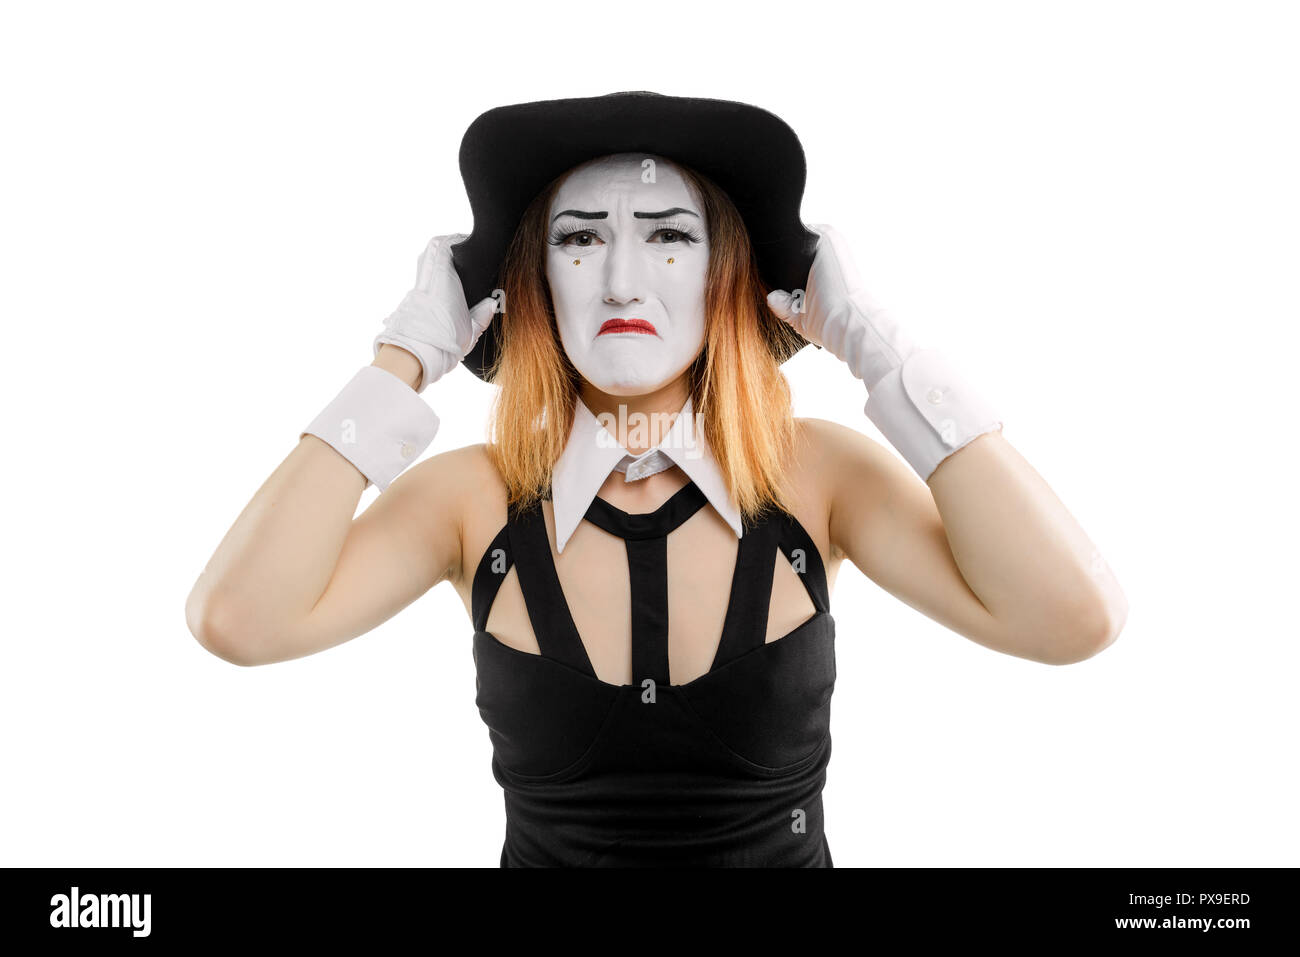 Sad female mime on white - Stock Image